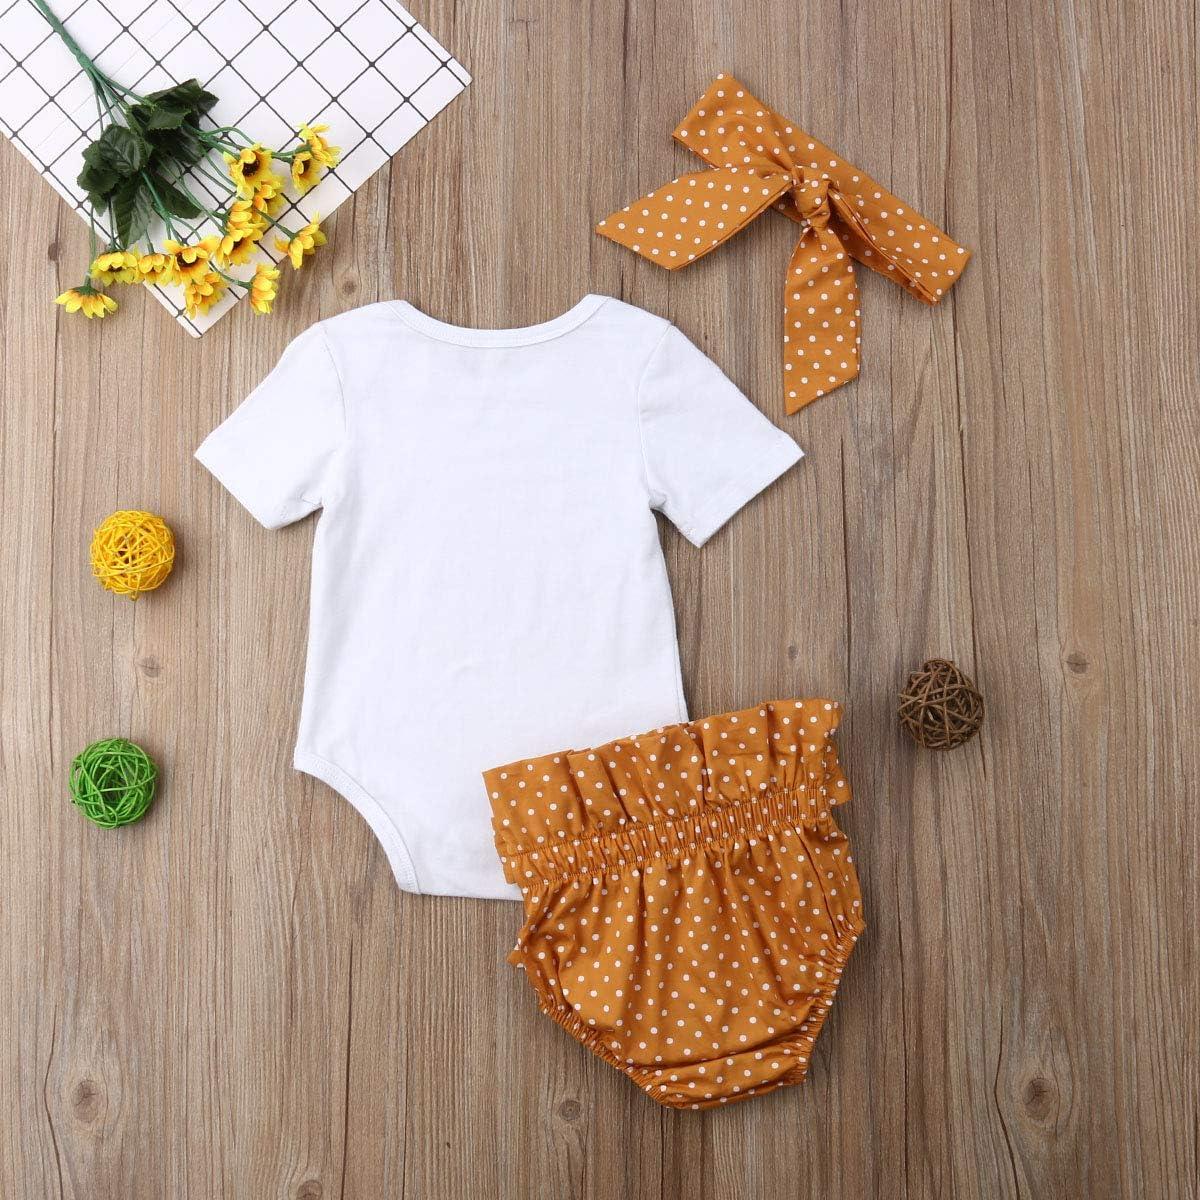 Gniherii Newborn Baby Girls Summer Clothes 3Pcs Short Sleeve Romper Shirt Headband Outfit 0-18M Polka Dot Shorts